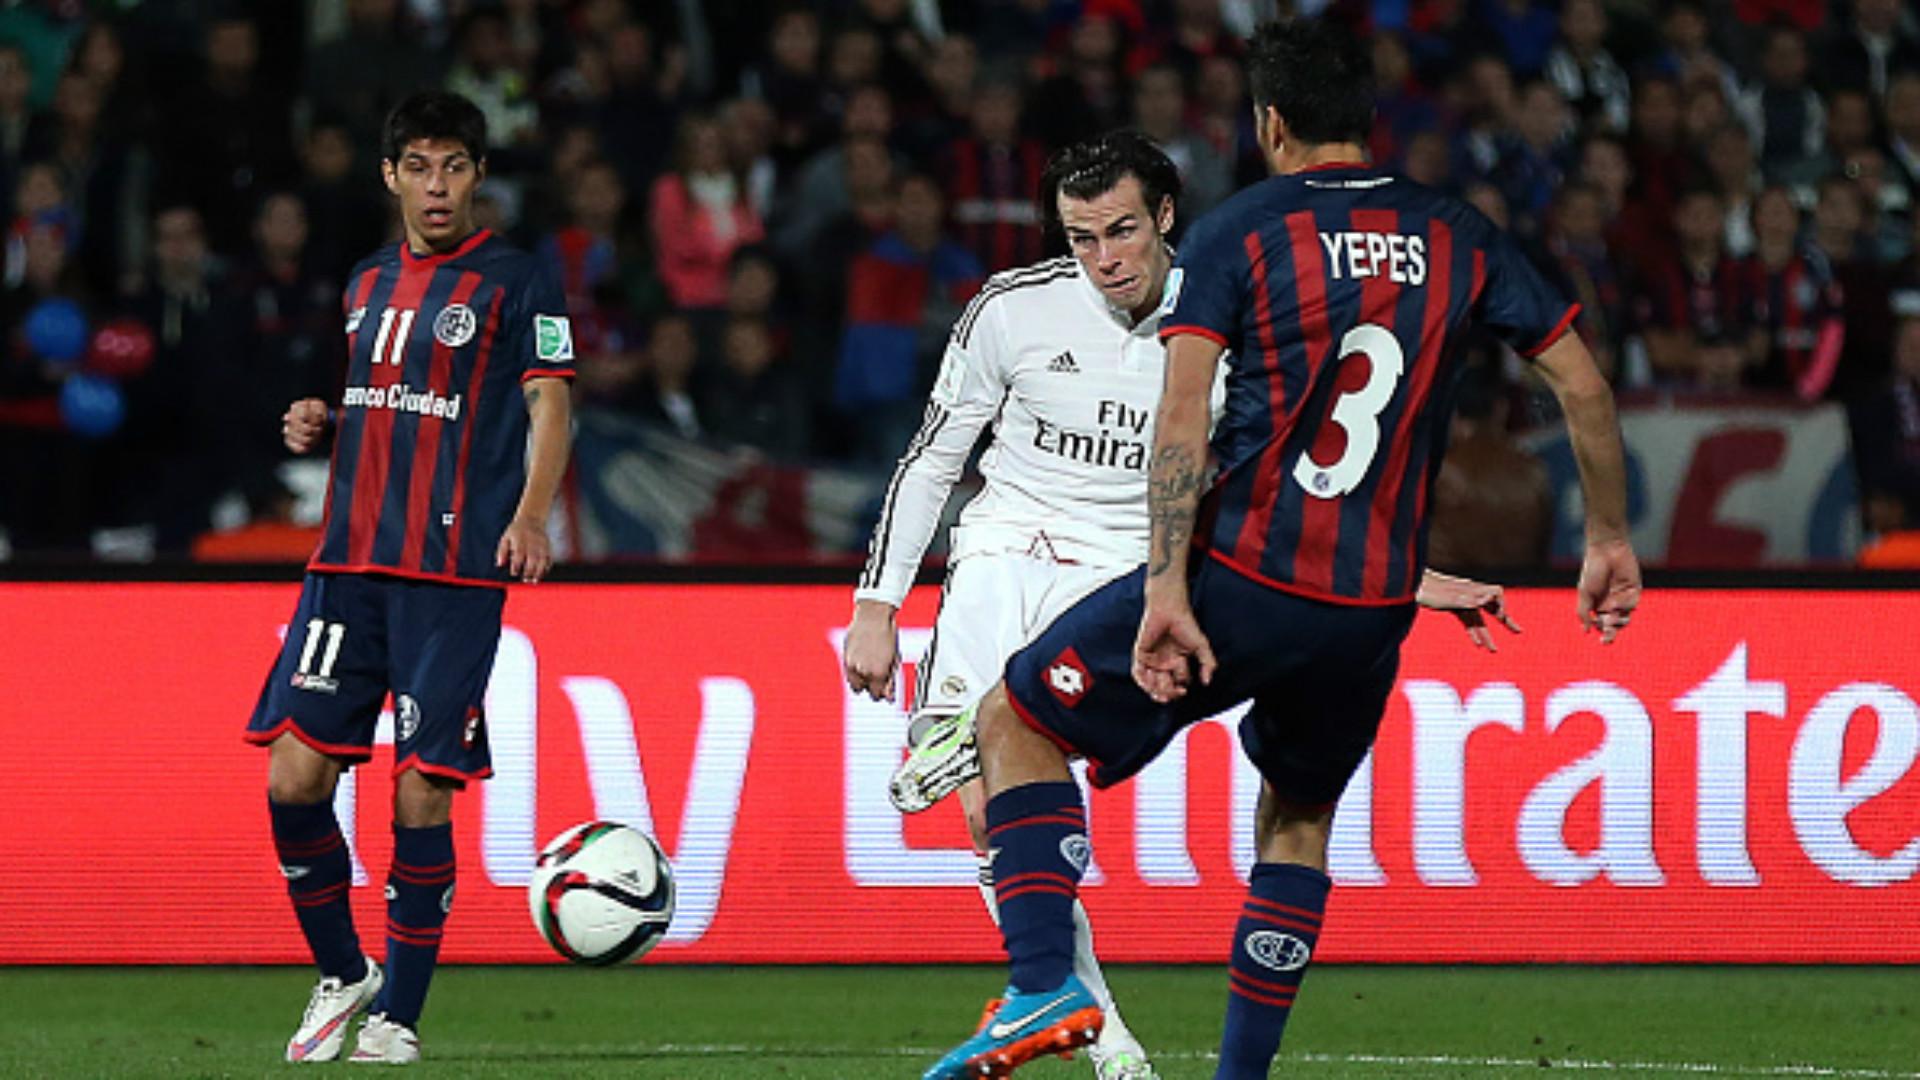 final del mundial de clubes 2014 real madrid vs san